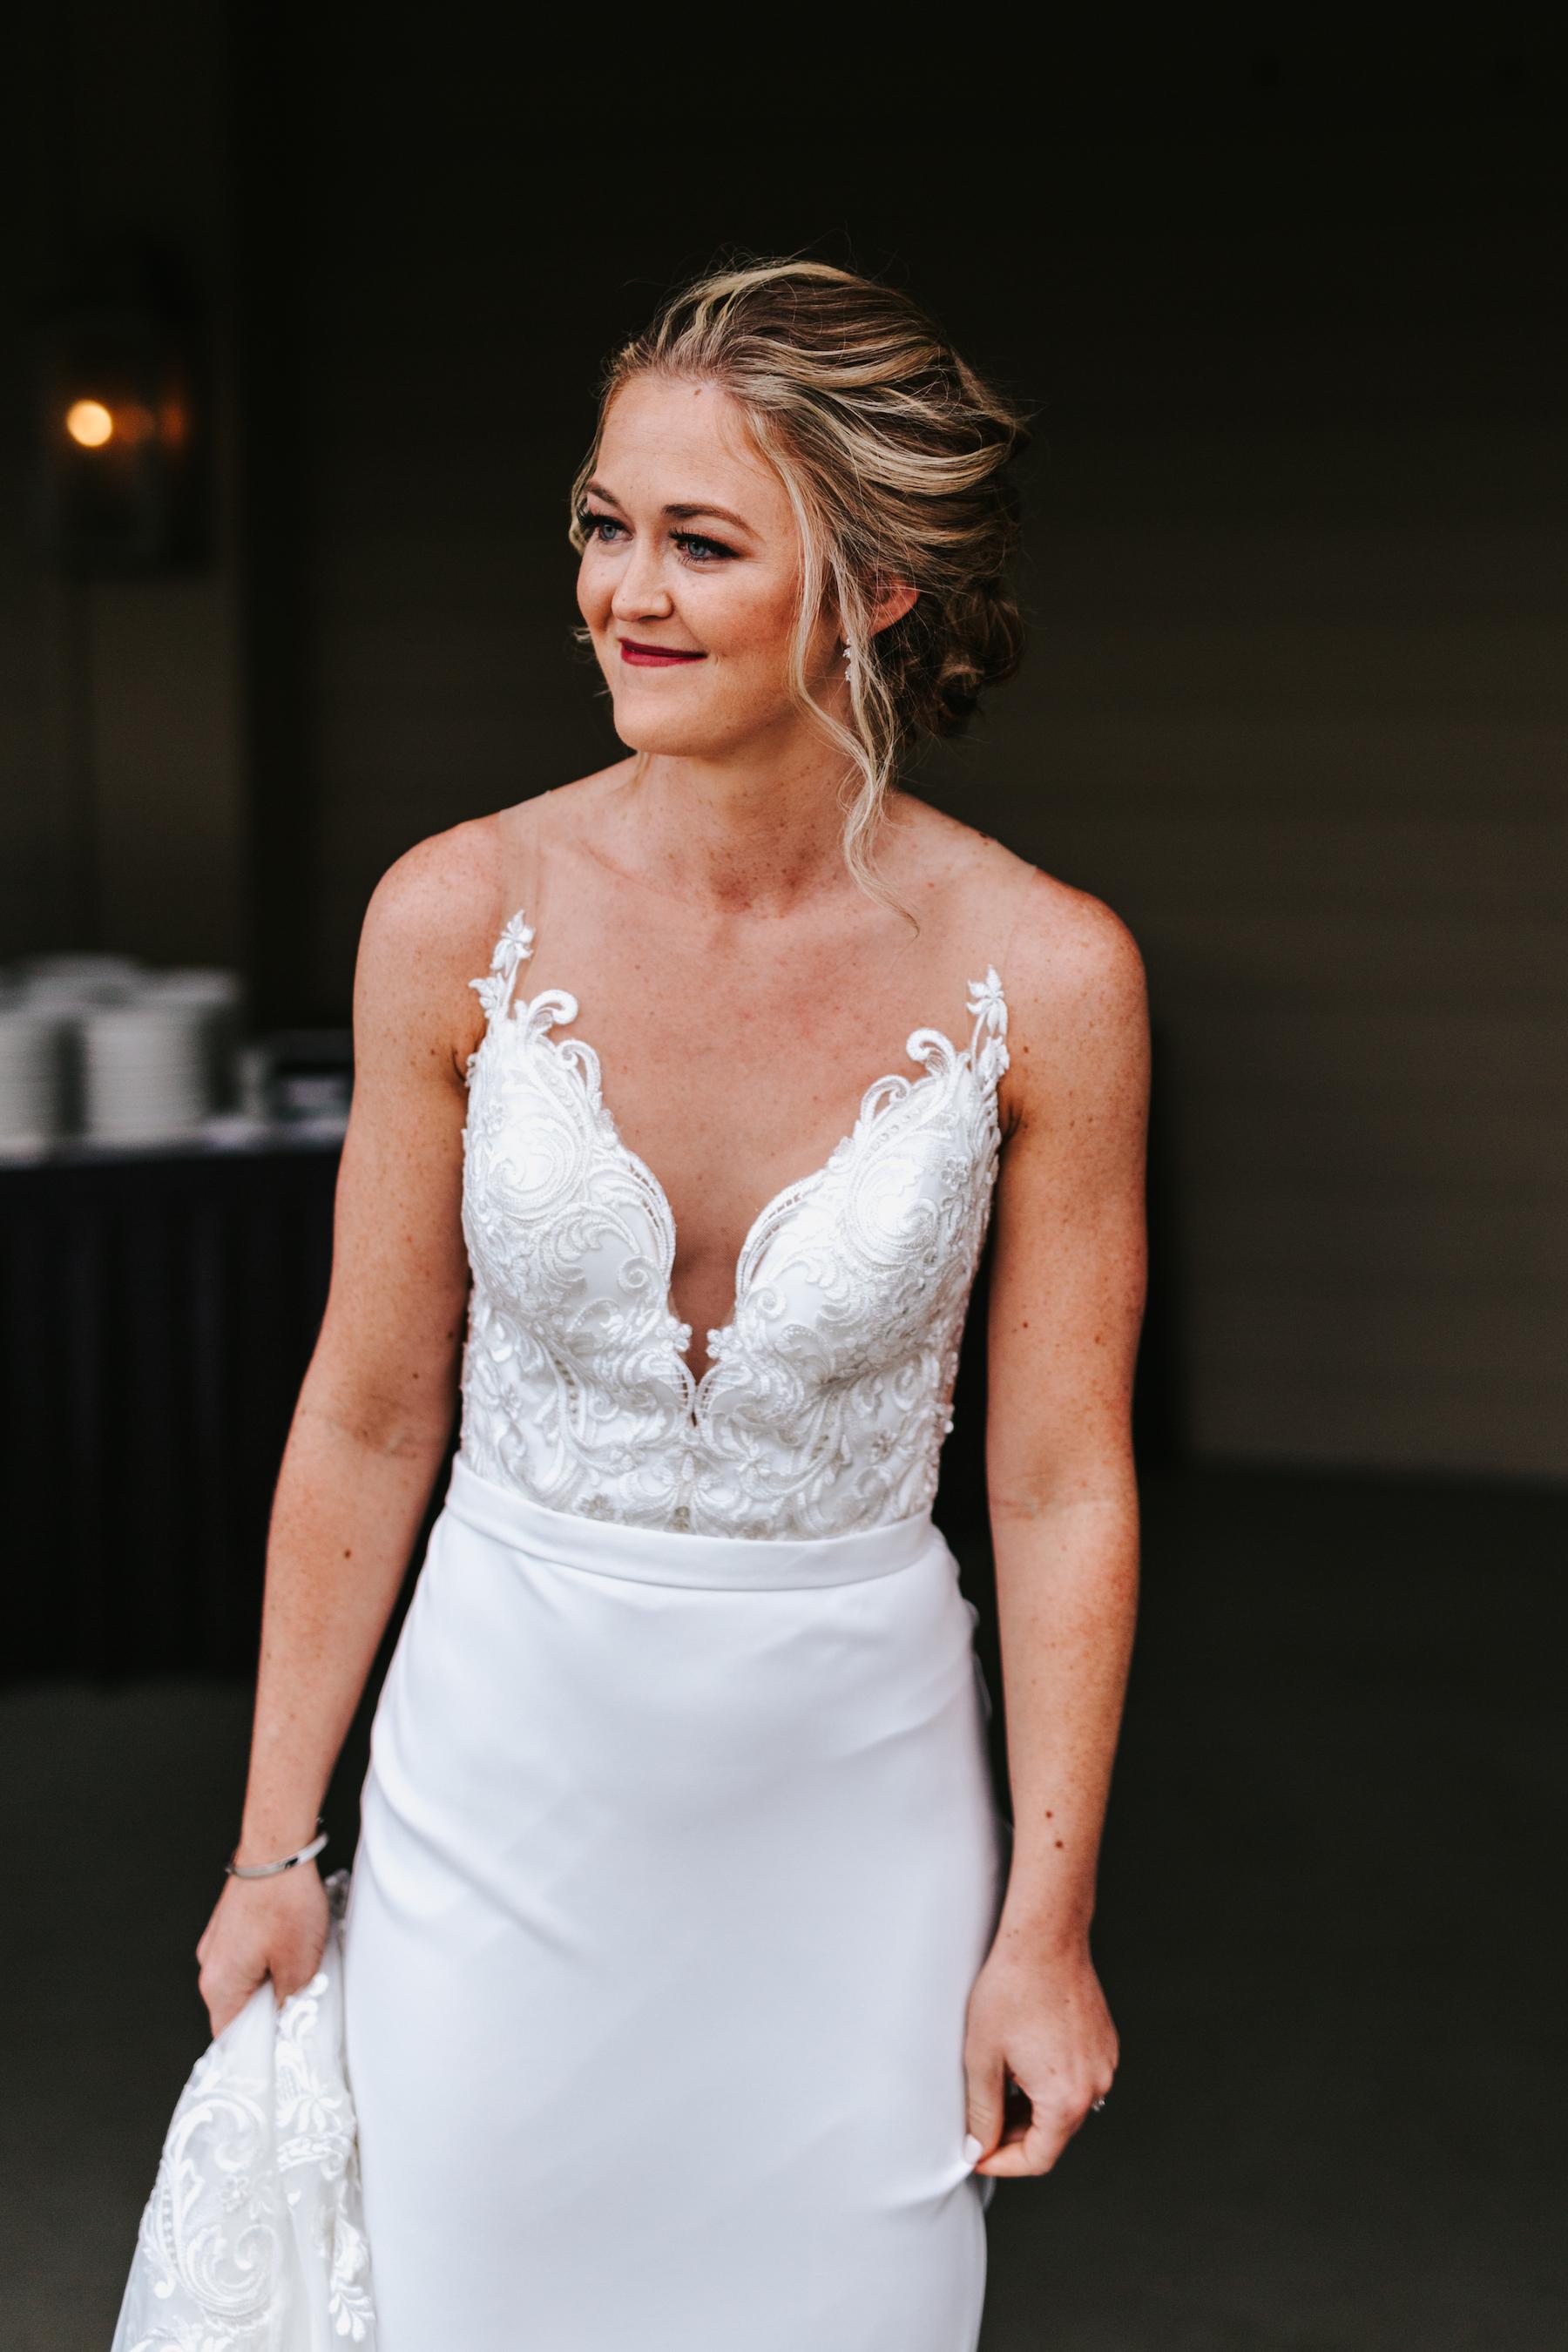 wedding-engagement-photographer-spartanburg-greenville-columbia-carolina-south-north-462.JPG